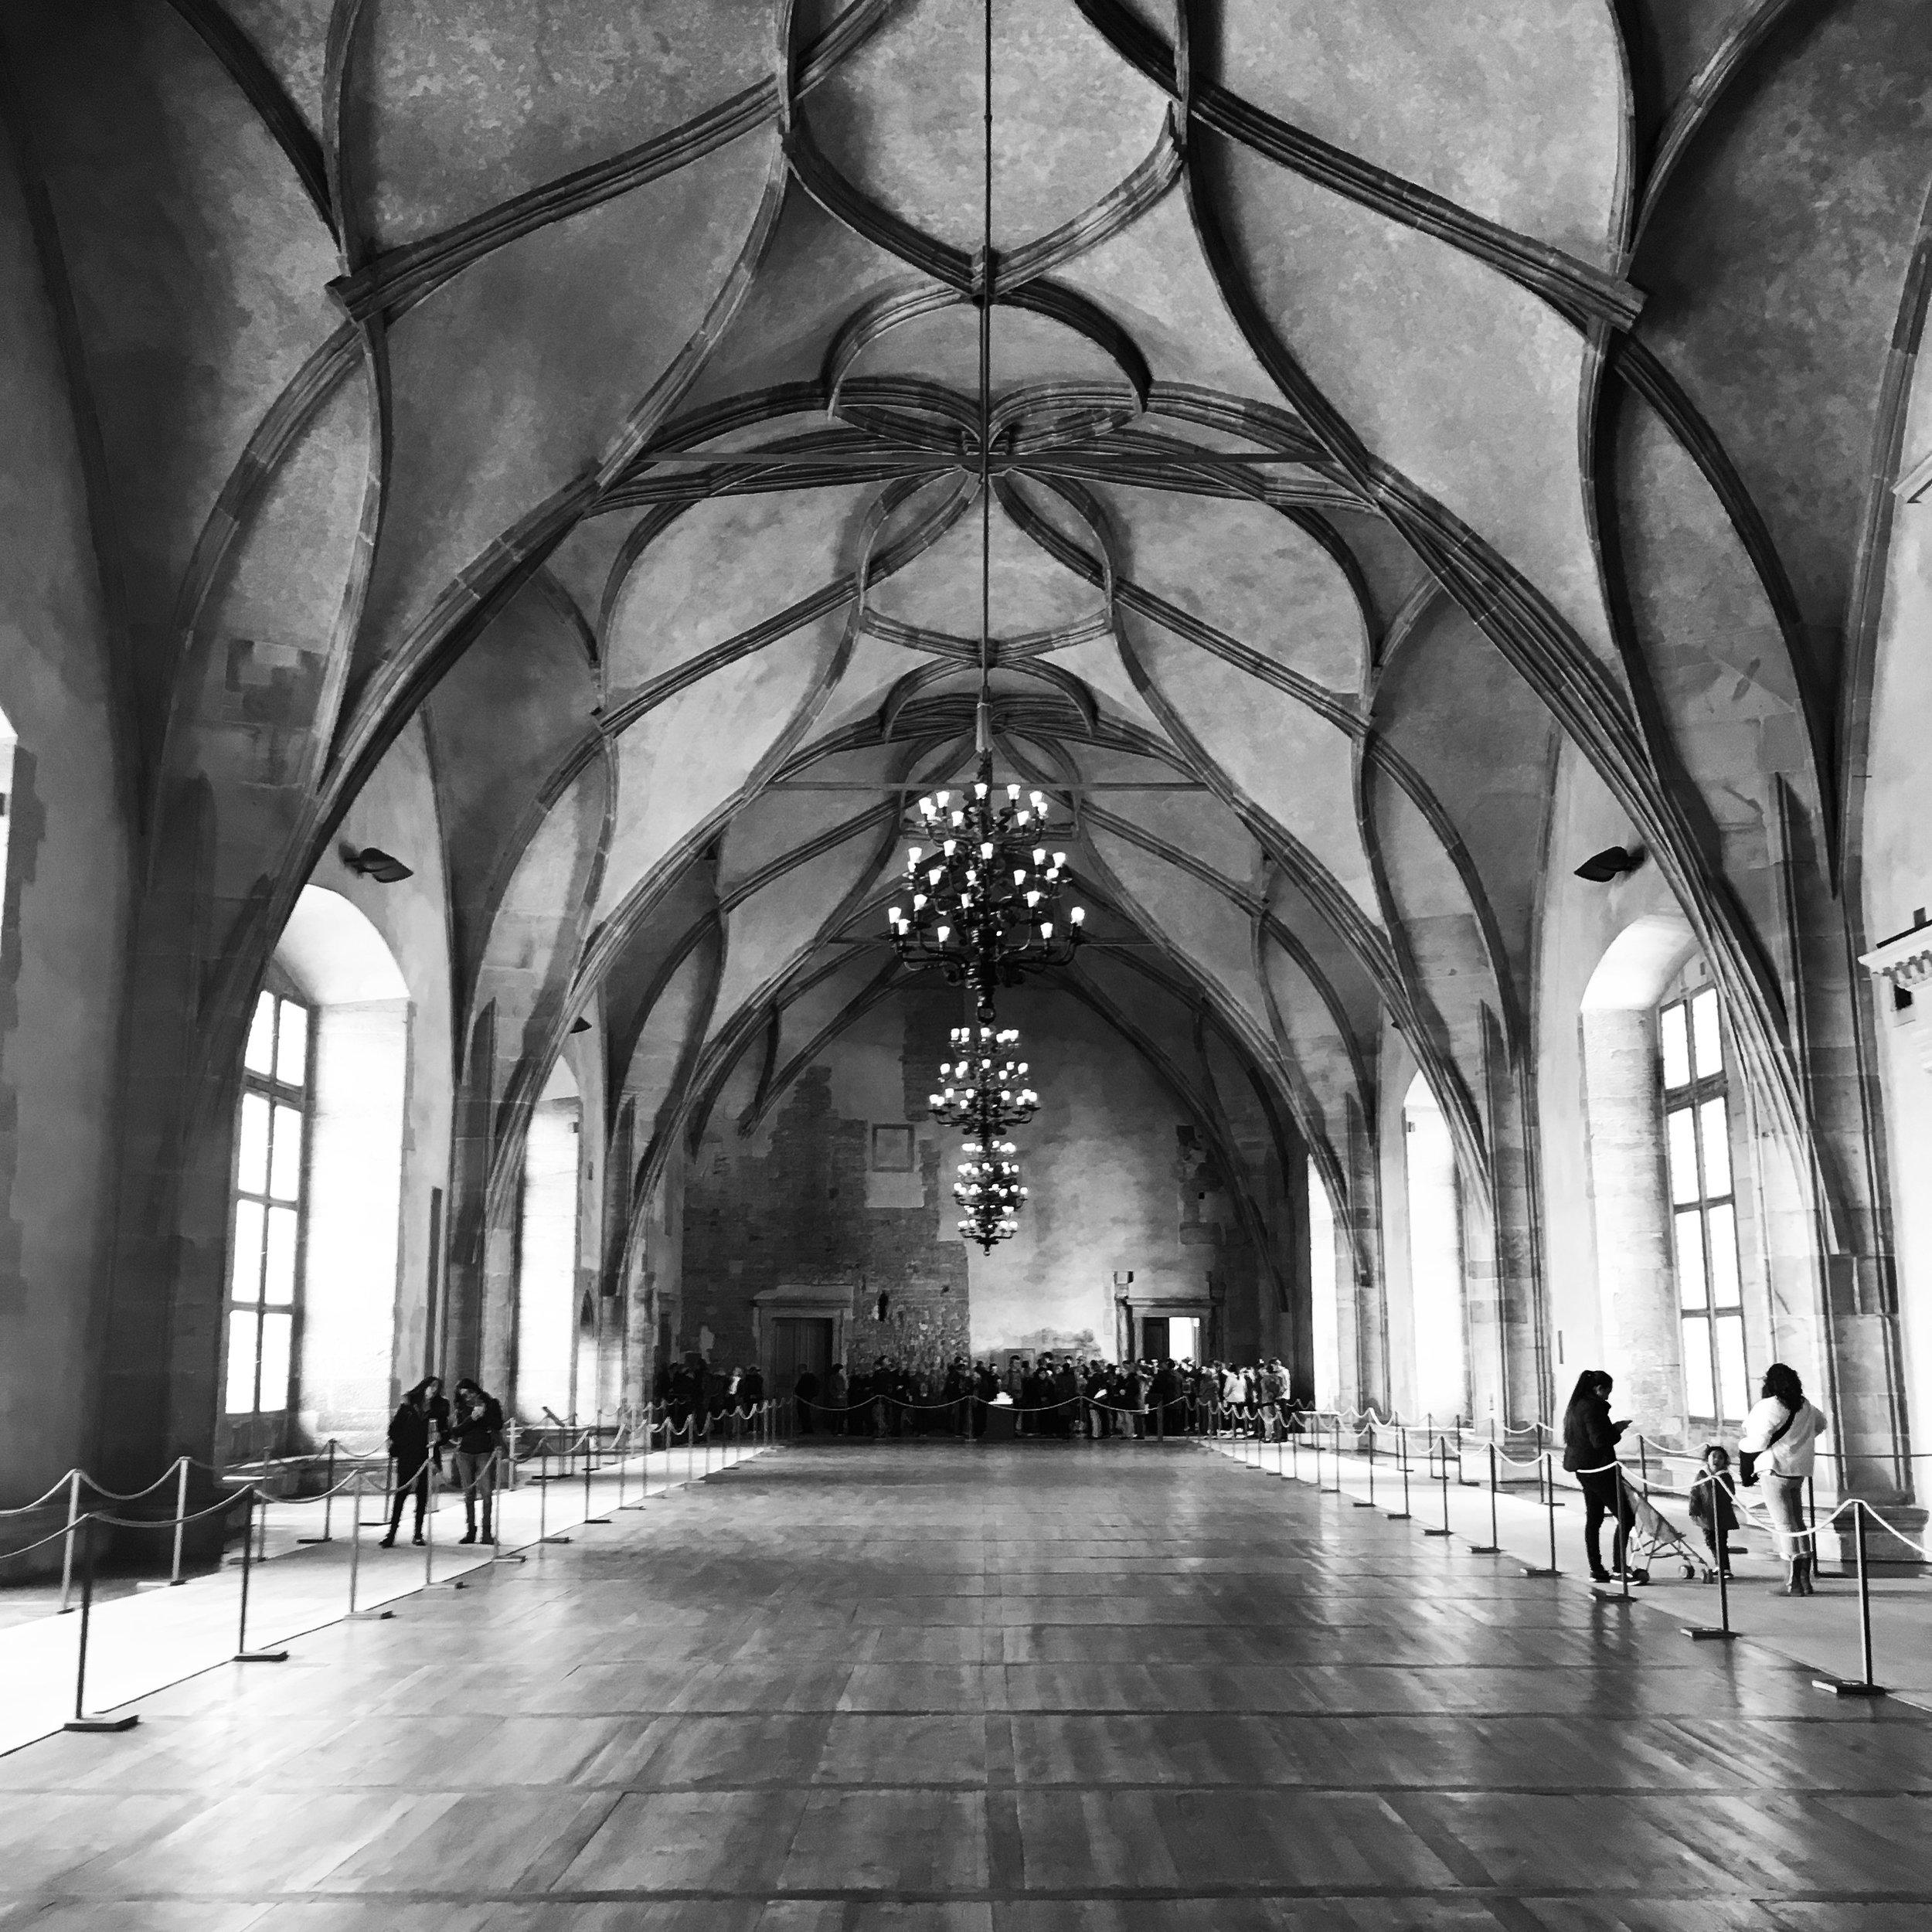 Prague_Vladislav Hall-Prague Castle2.JPG